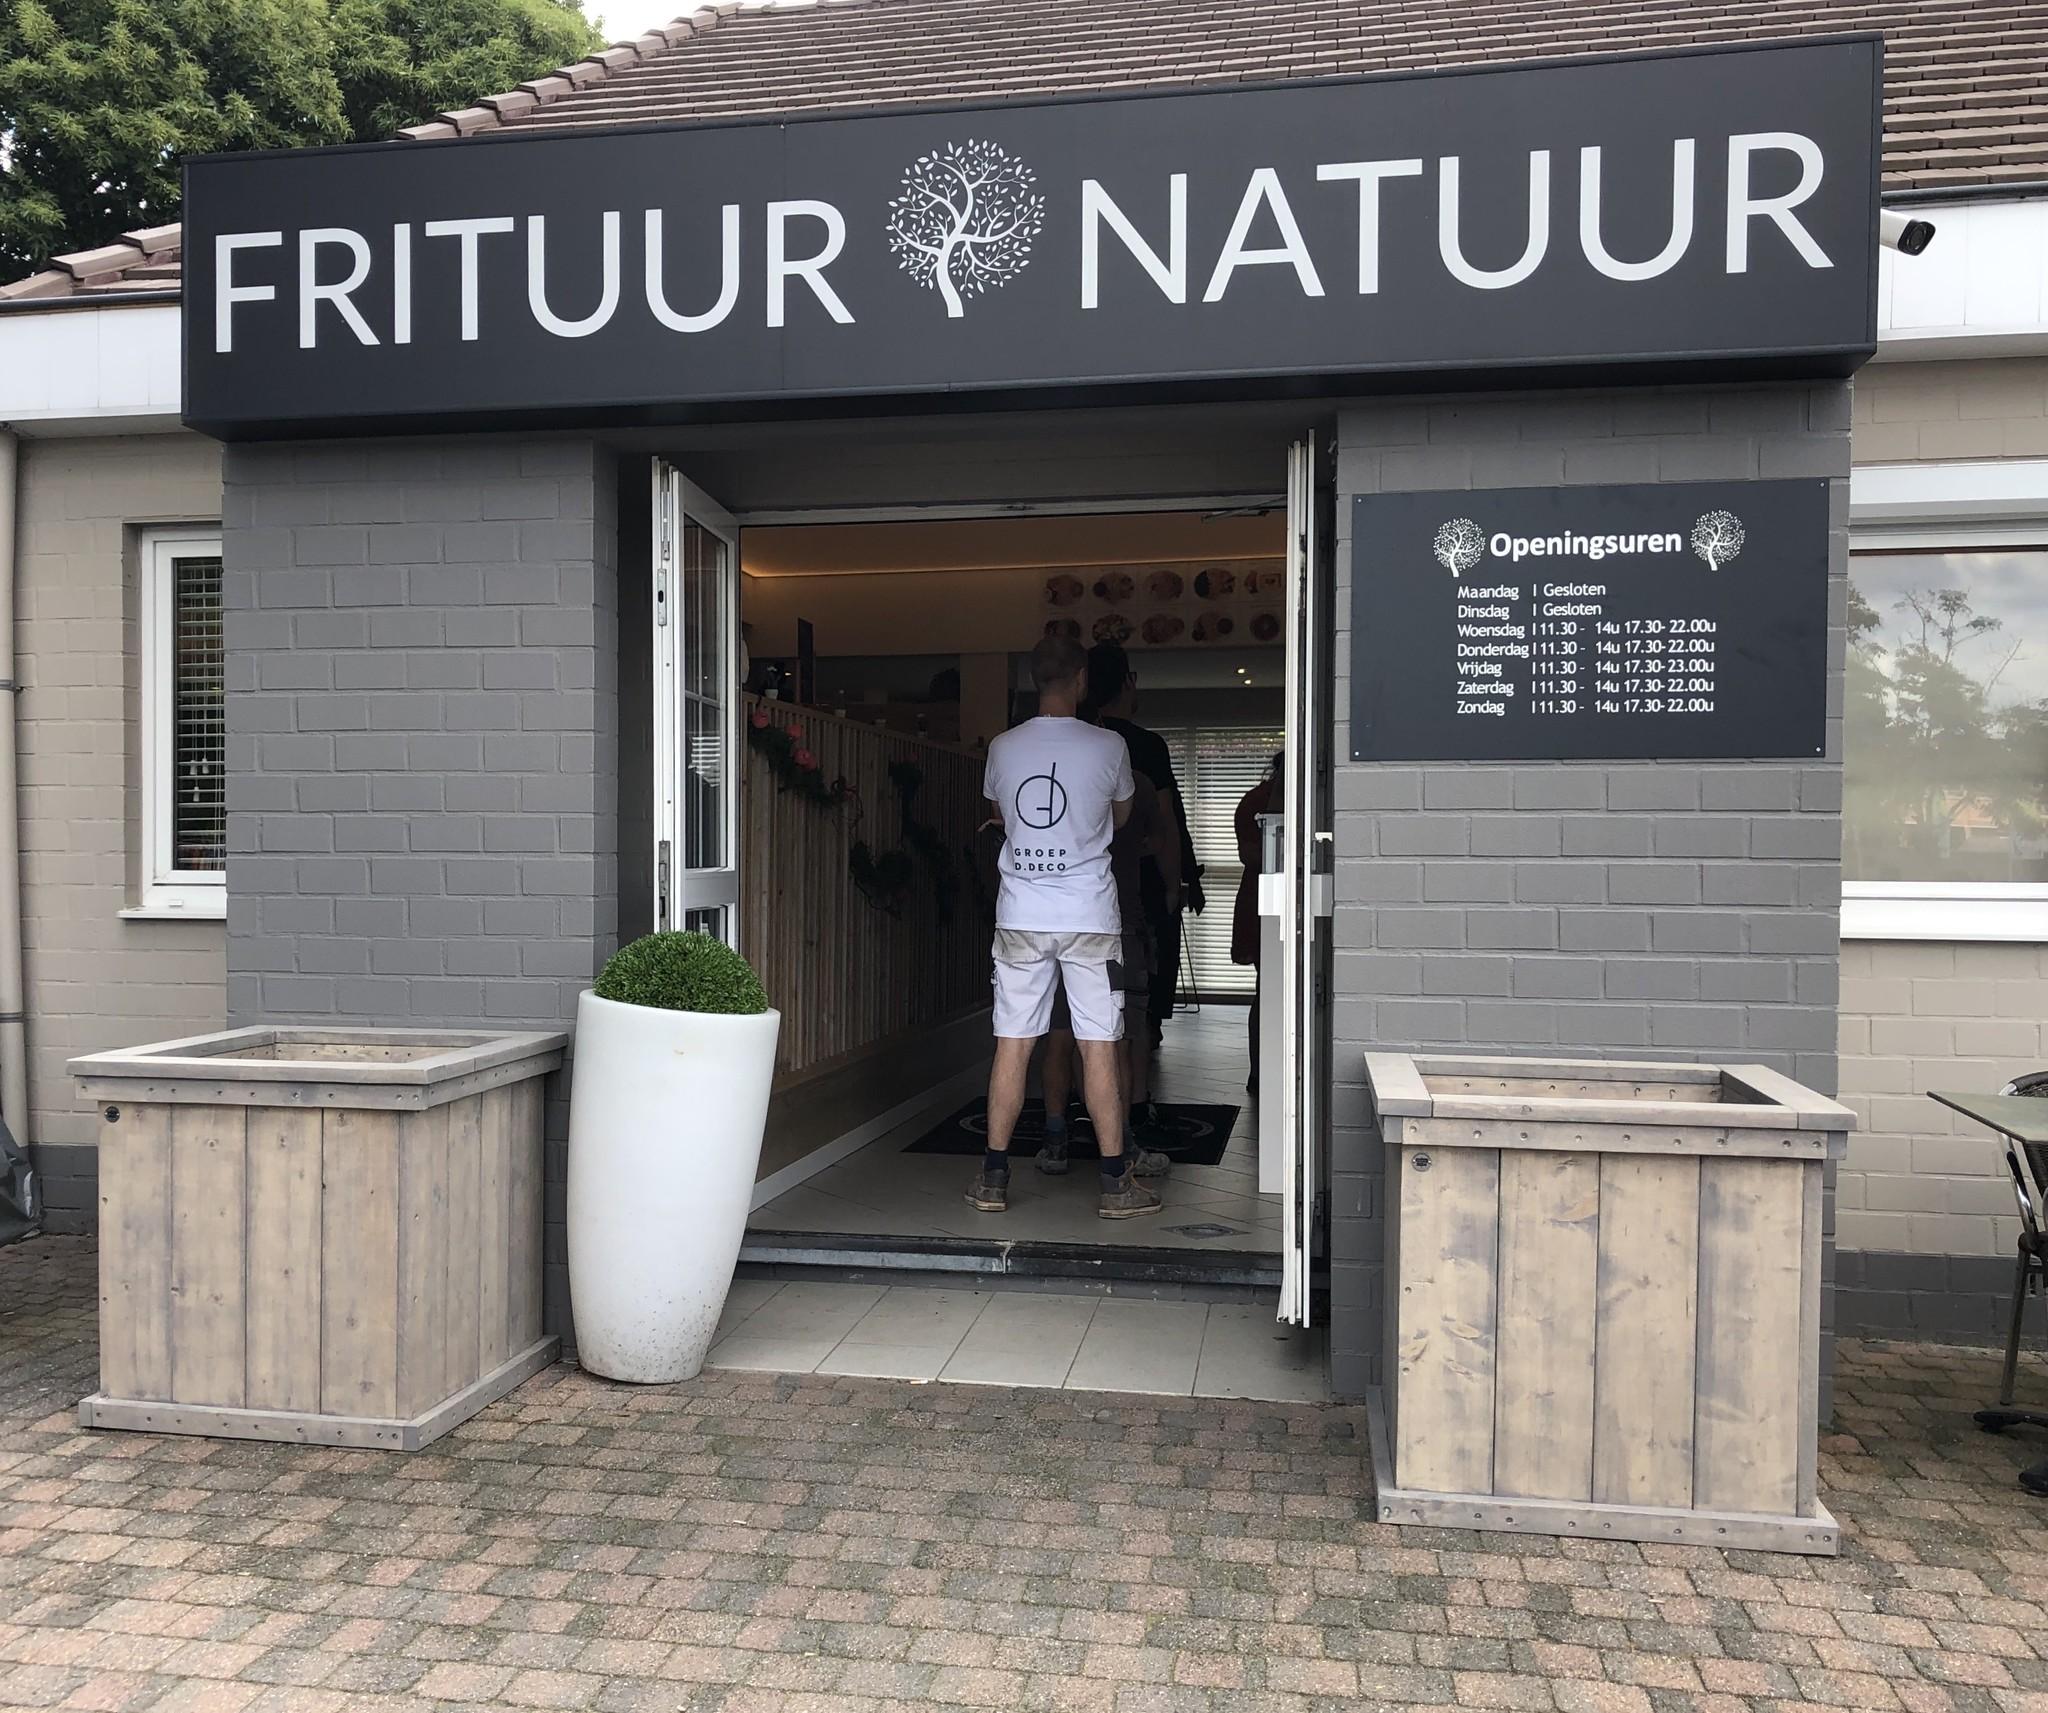 Natuur plantenbak / Bloembak van steigerhout XL : Model Natuur